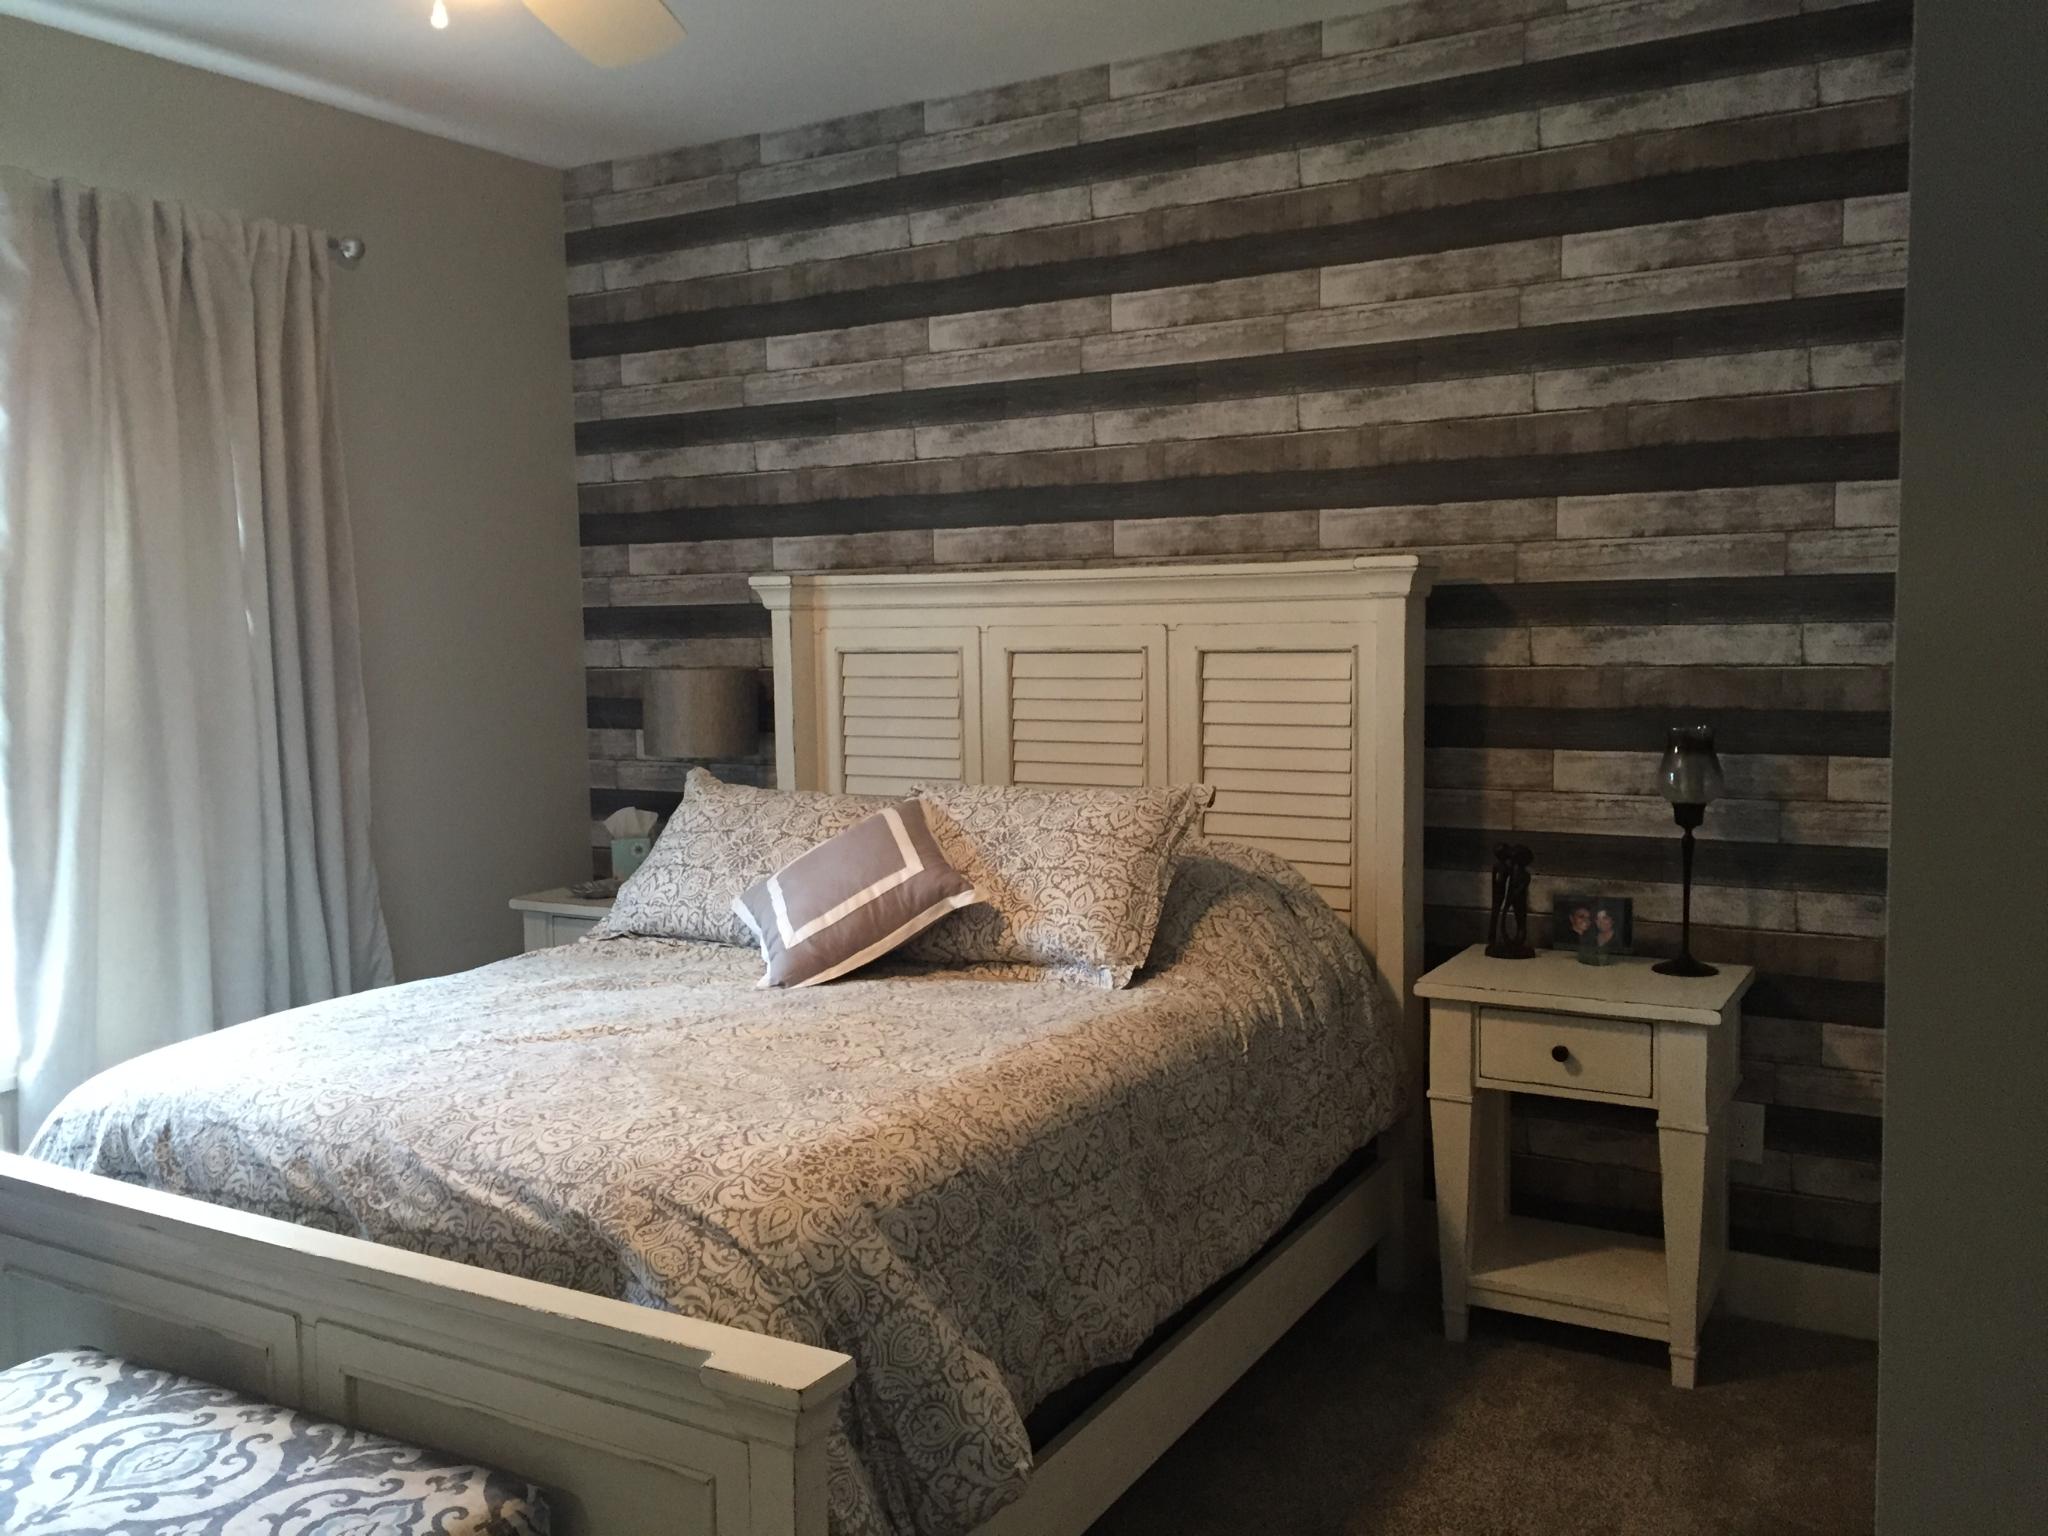 Reclaimed wood look Wallpaper